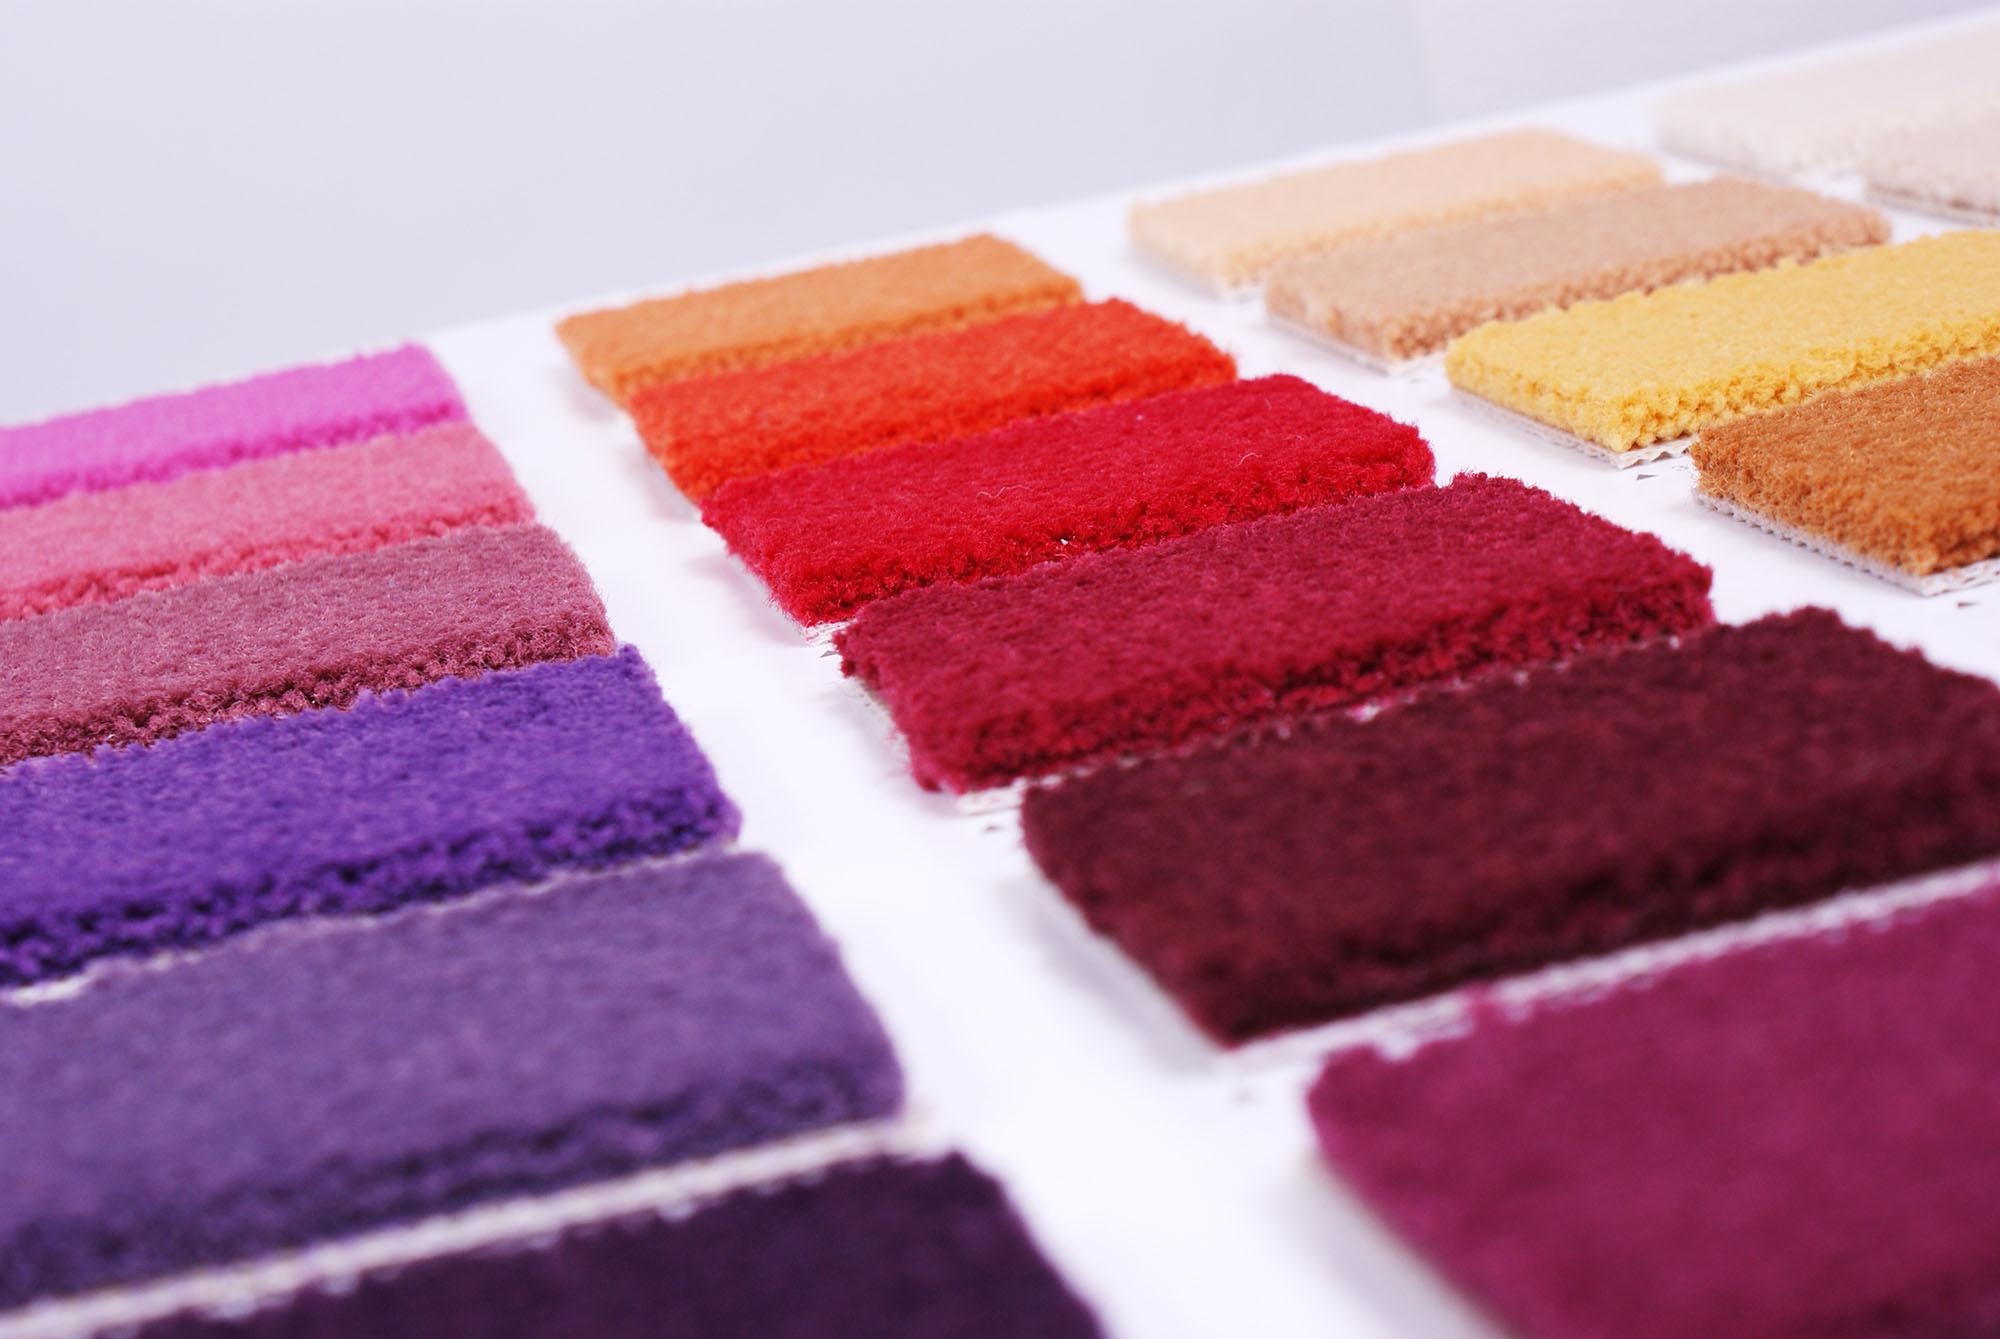 Carpet Dyeing Australia - Full Room Carpet Dyes, Bleach Spot Repair, Spot Dyeing Carpets